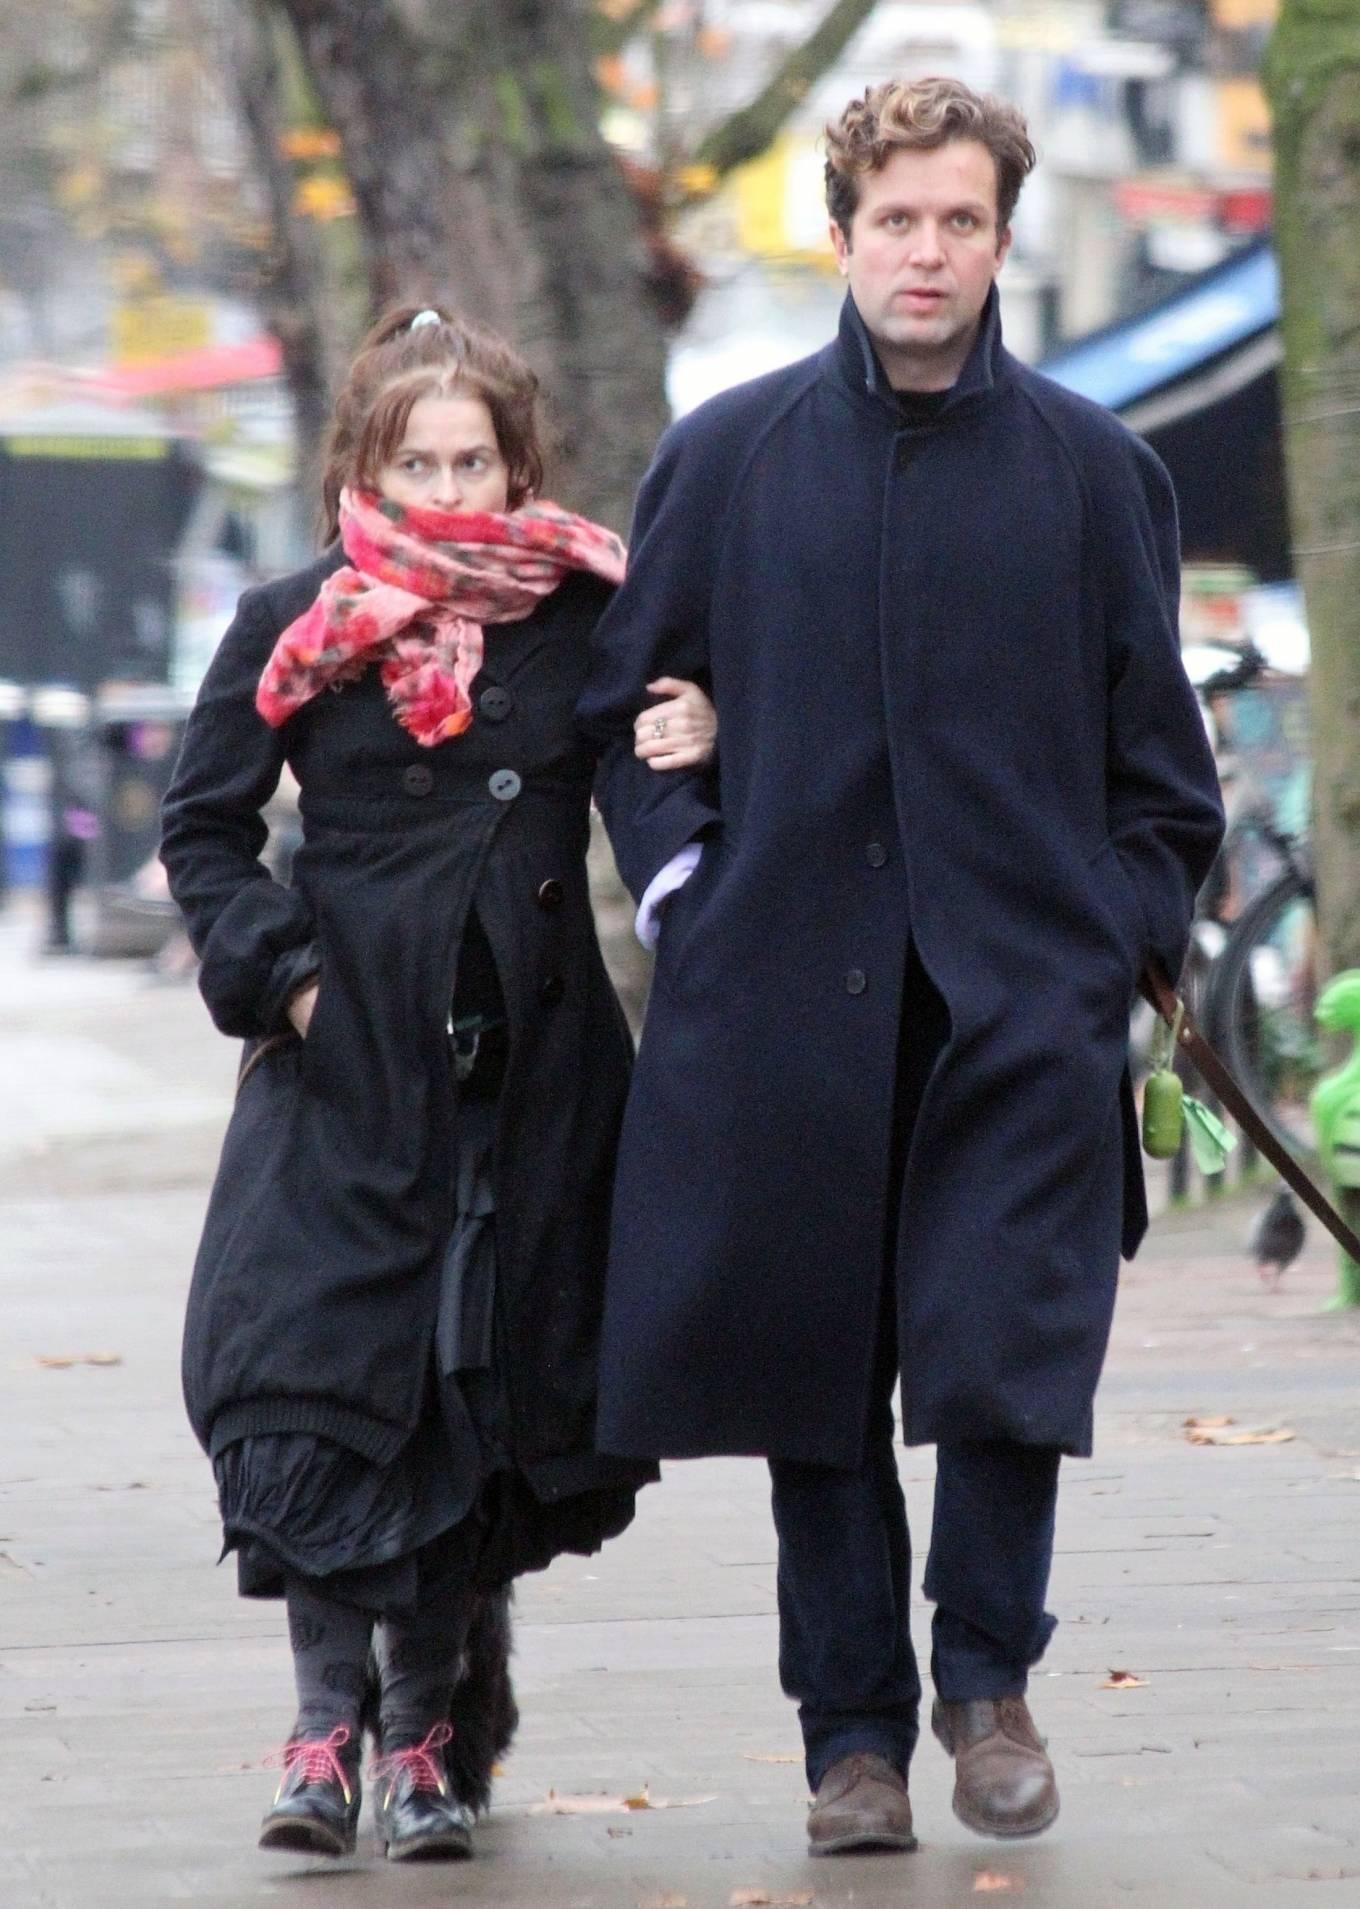 Helena Bonham Carter - With her boyfriend Rye Dag Holmboe in North London